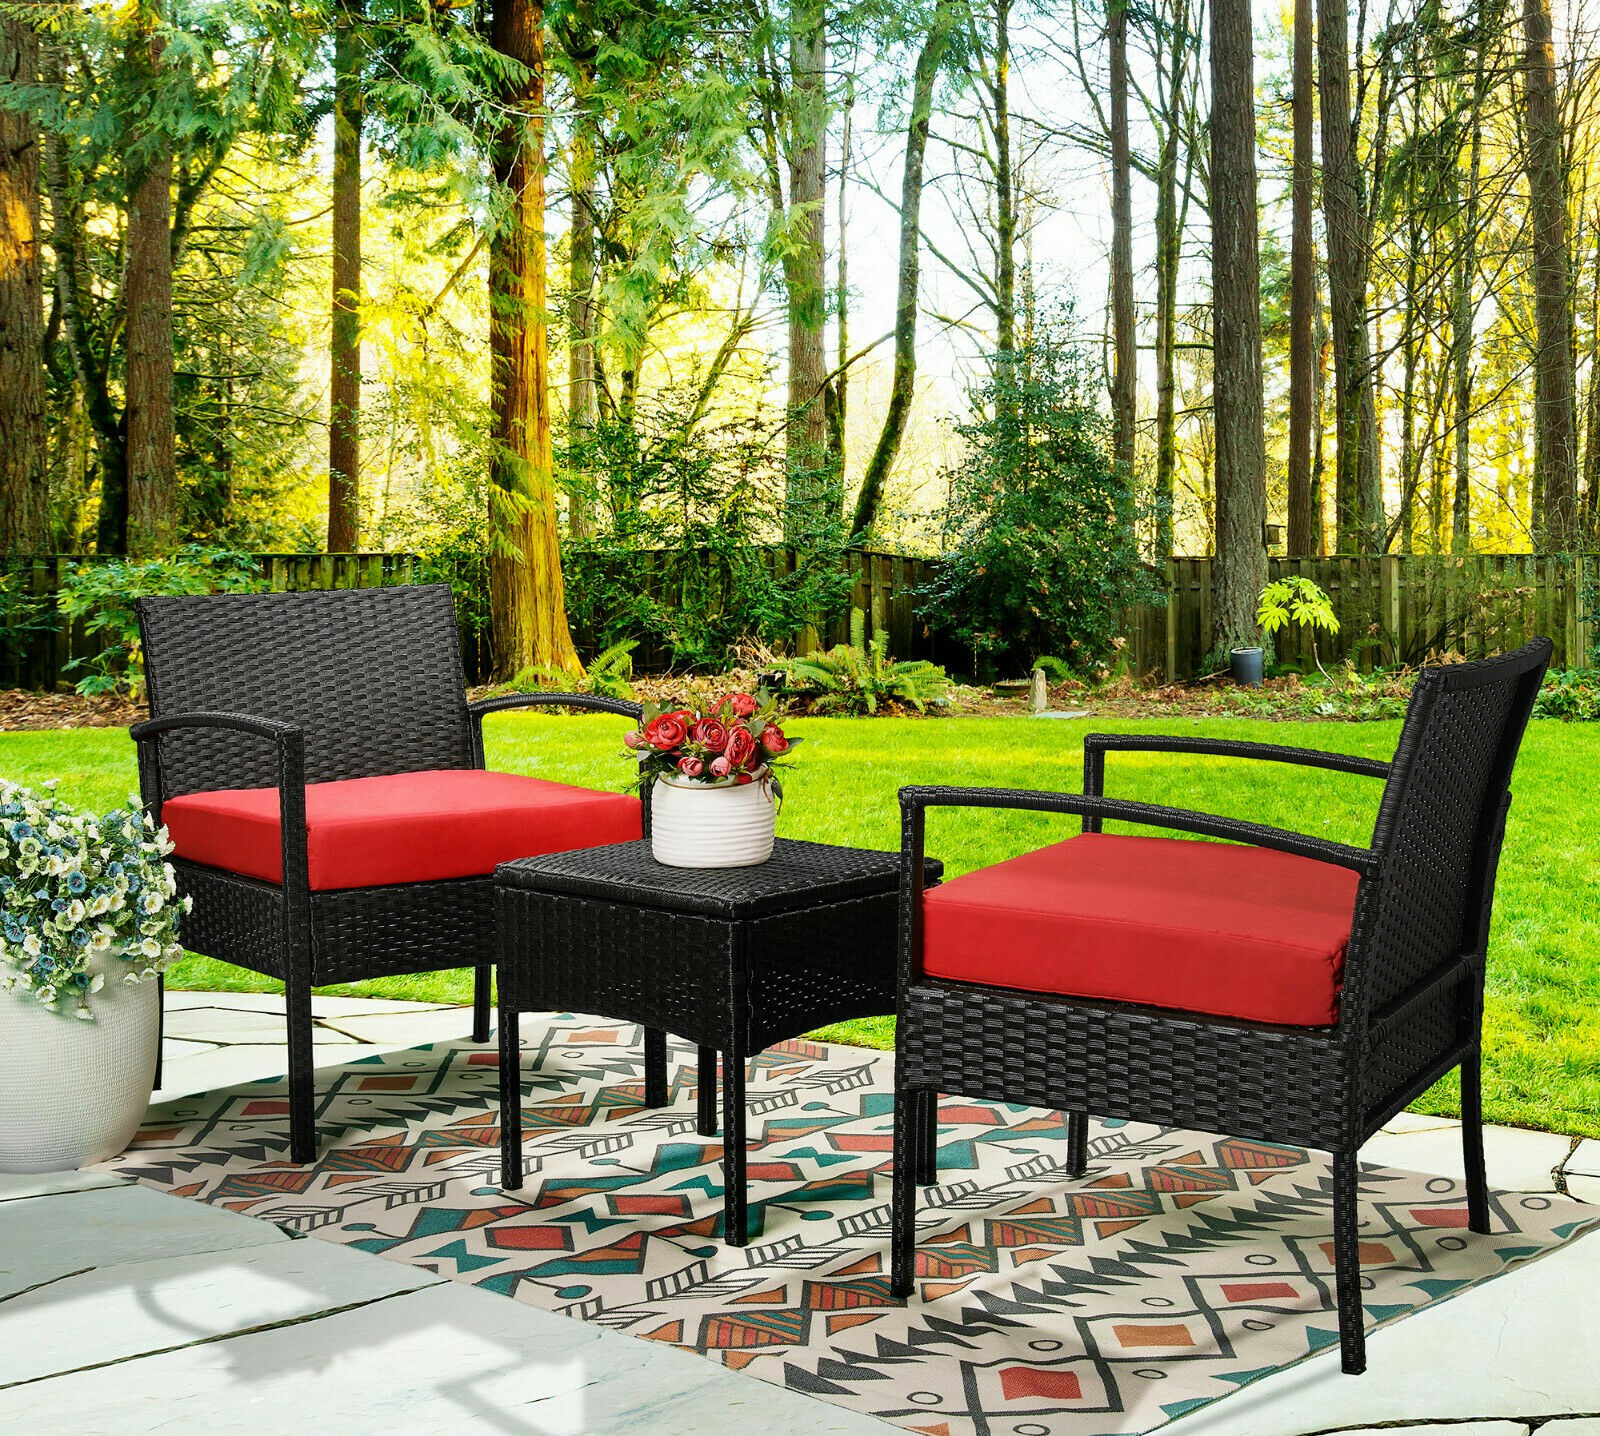 Outdoor Garden Patio Furniture Cushions